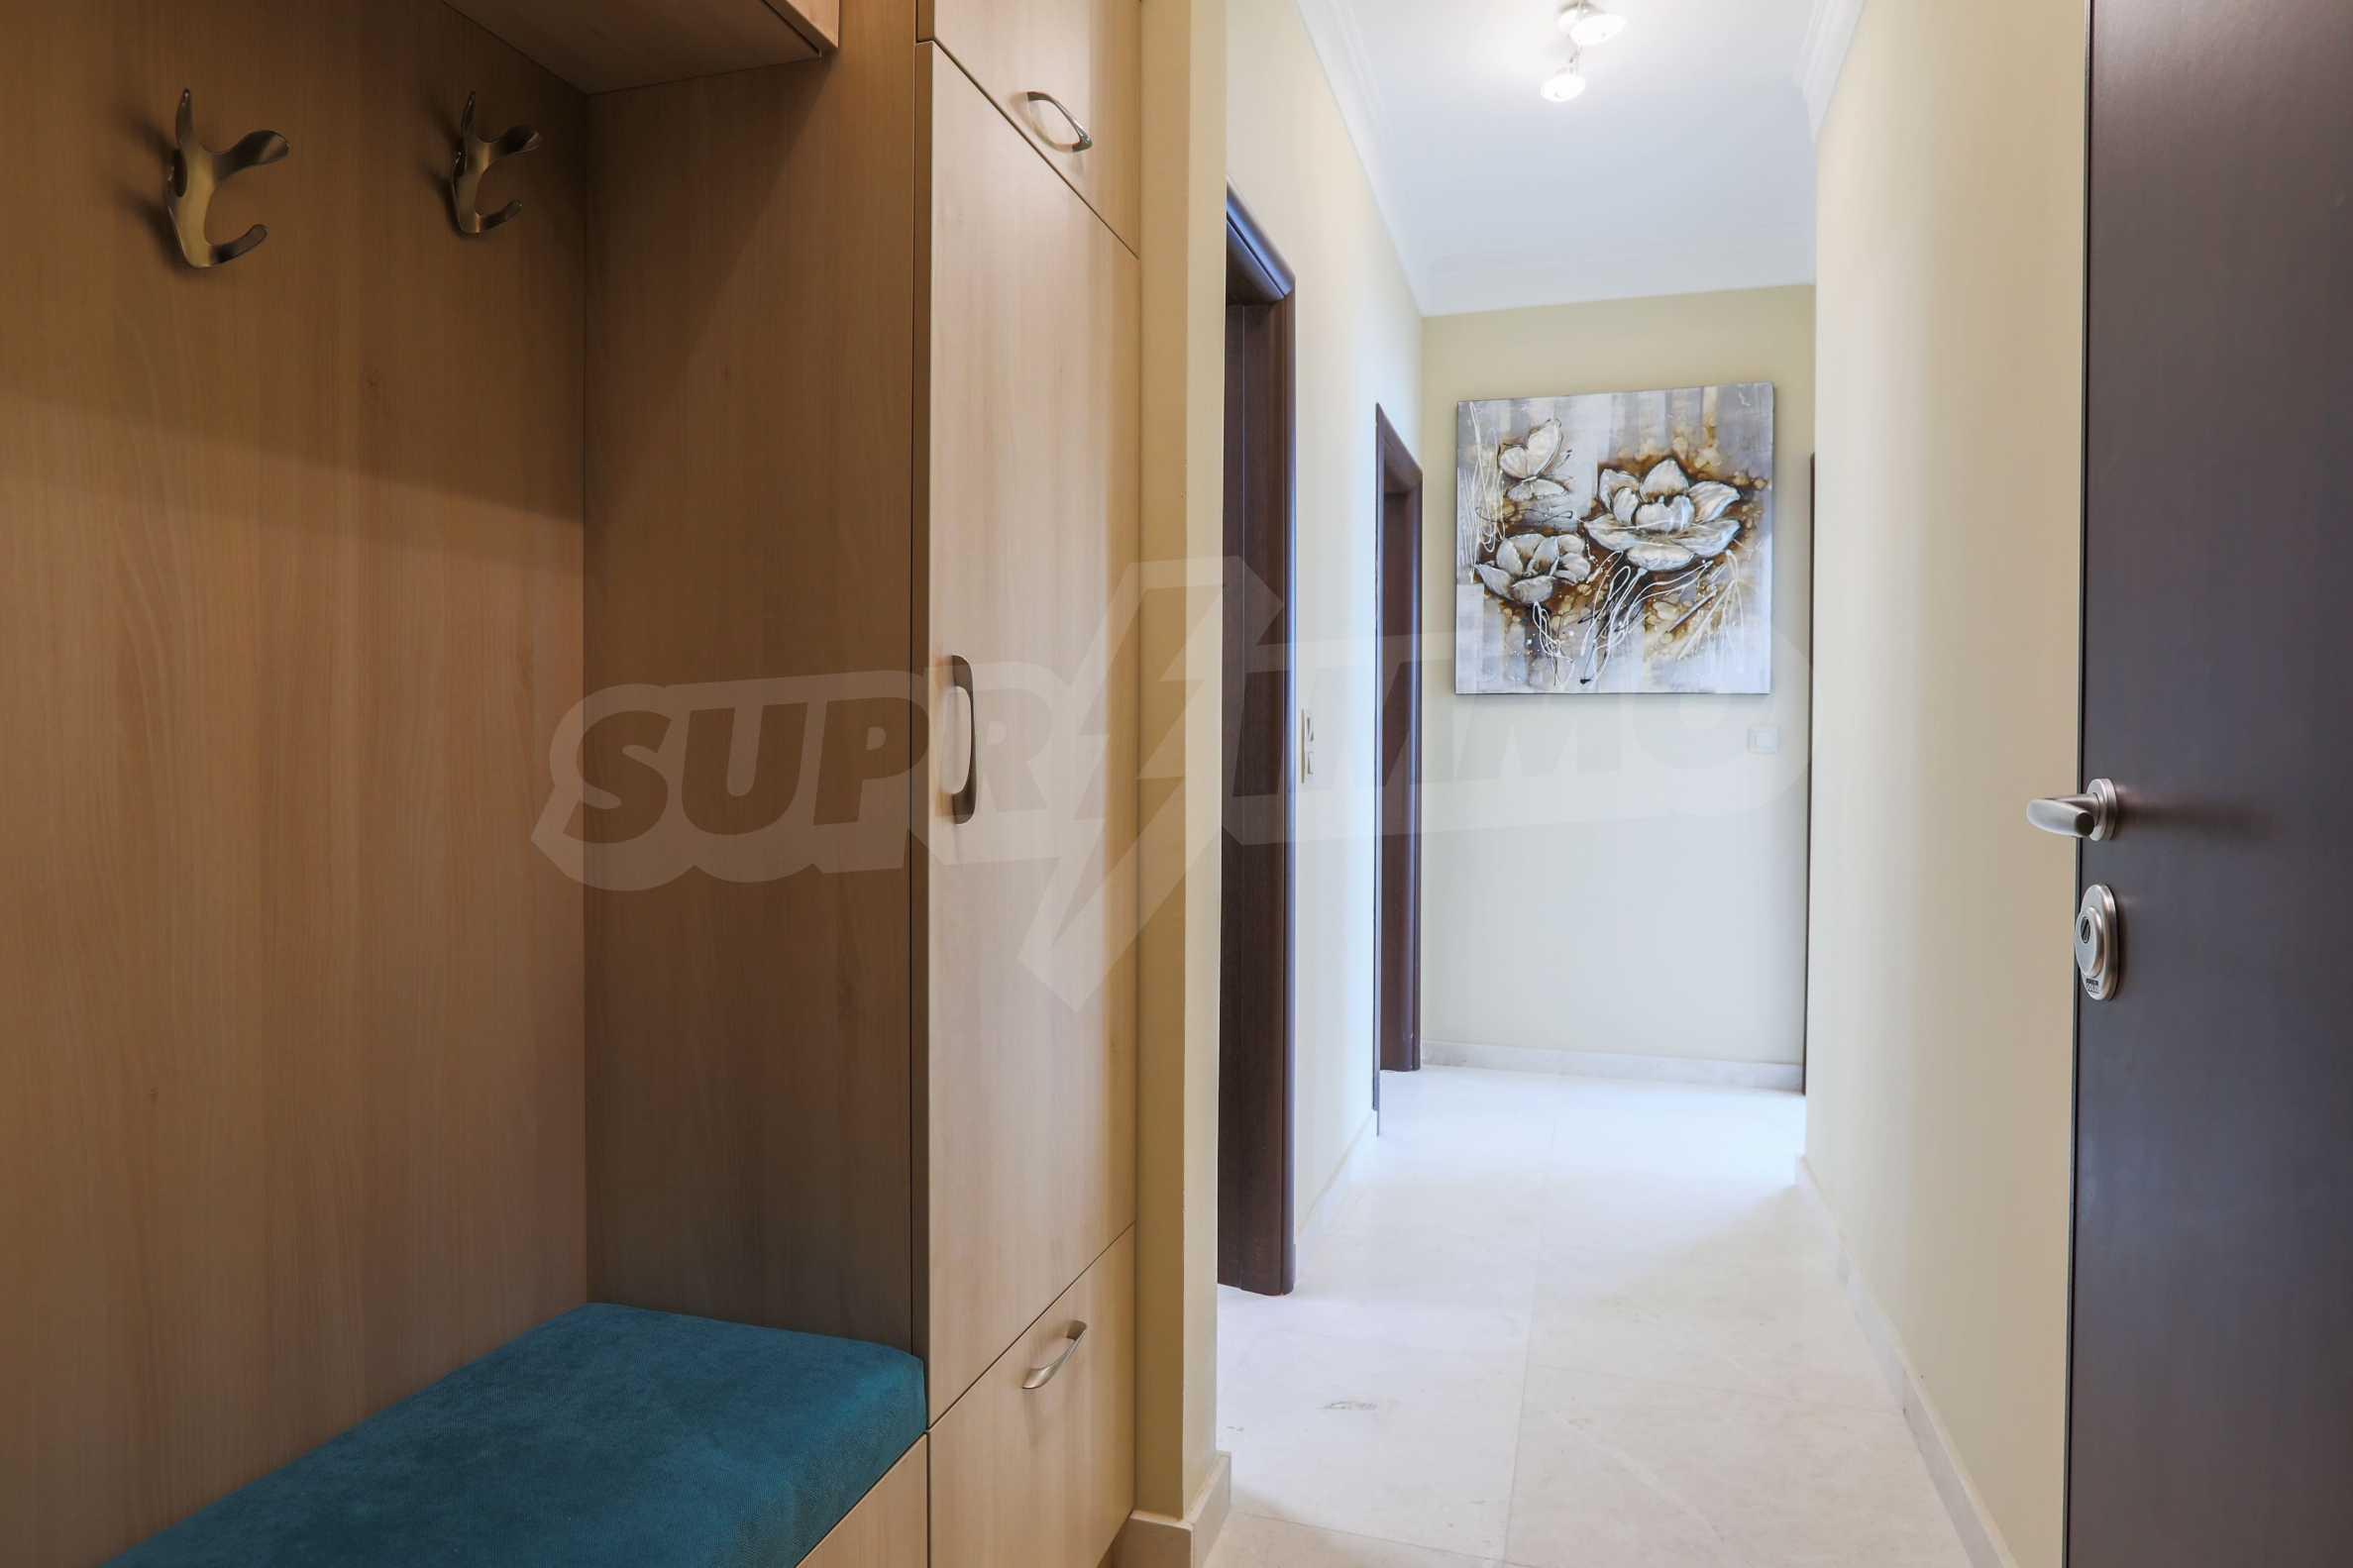 Комфортен двустаен апартамент под наем в Belle Époque Beach Residence, курорт Лозенец 10